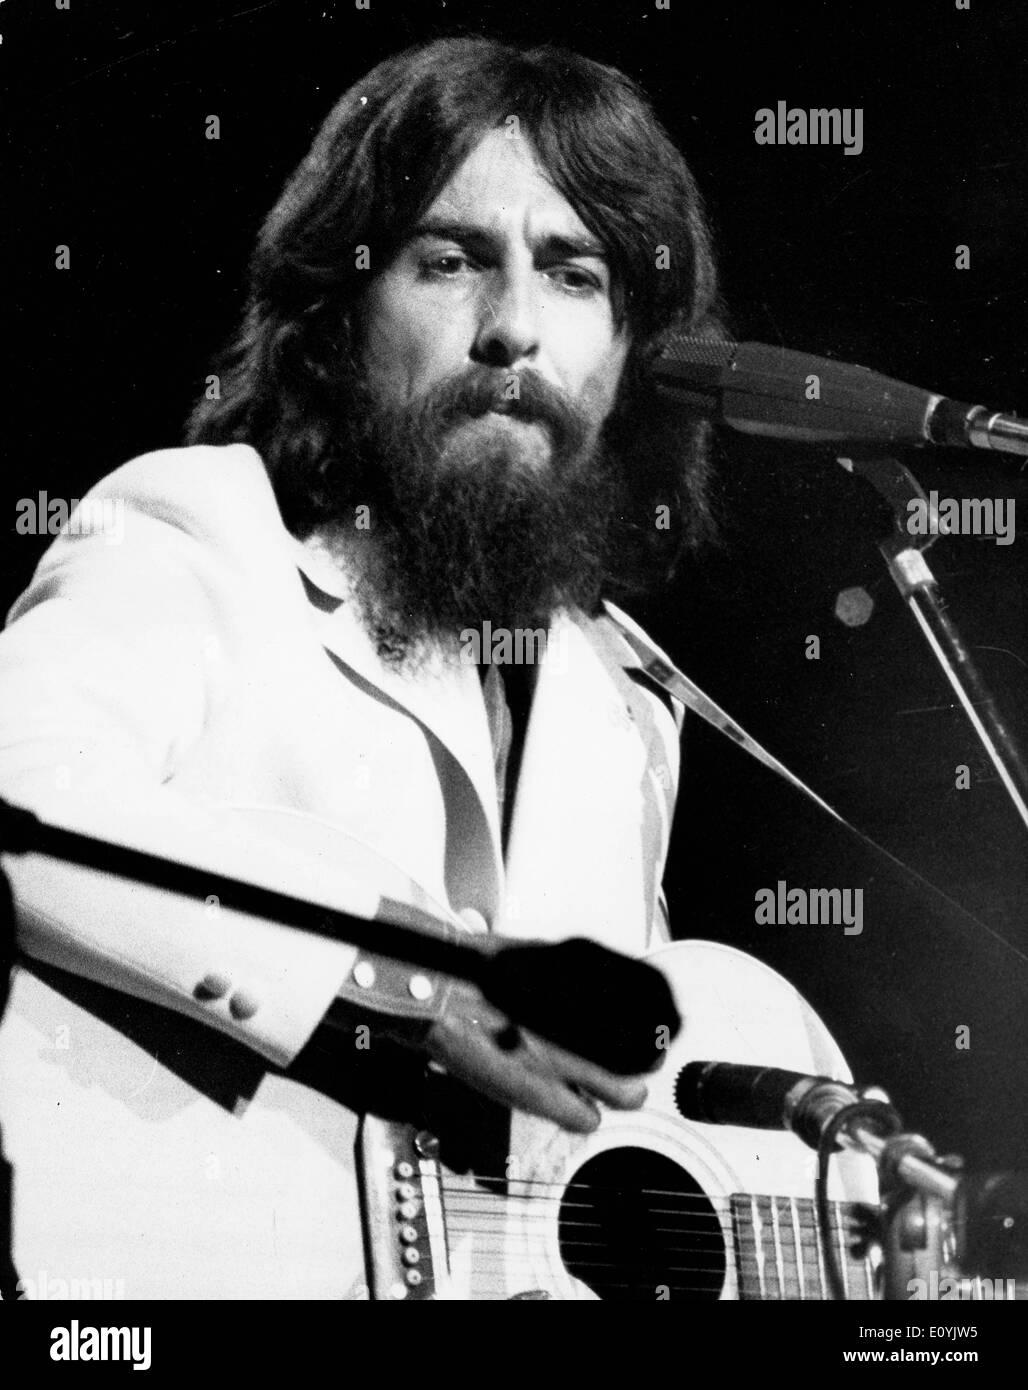 Beatles Guitarist George Harrison performs in concert - Stock Image